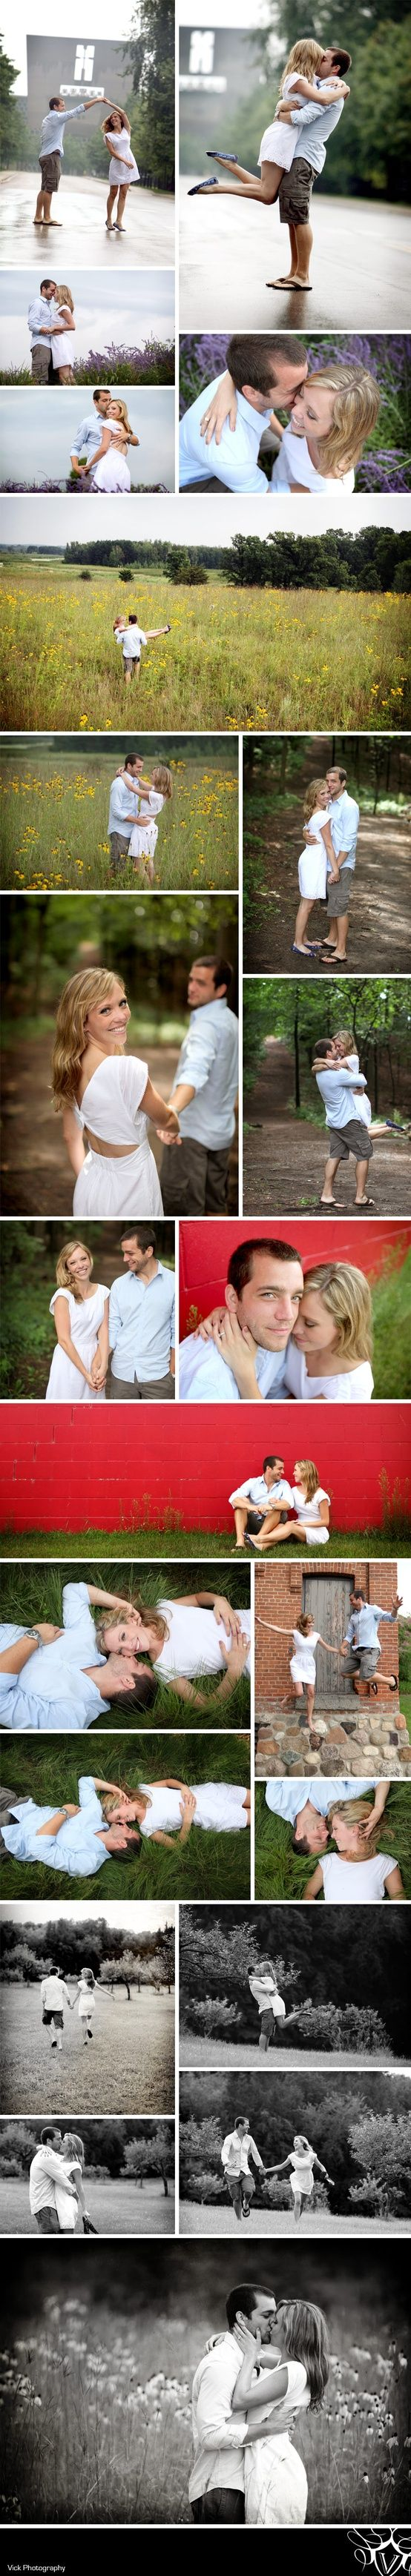 Wedding or engagement photo ideas MINNESOTA